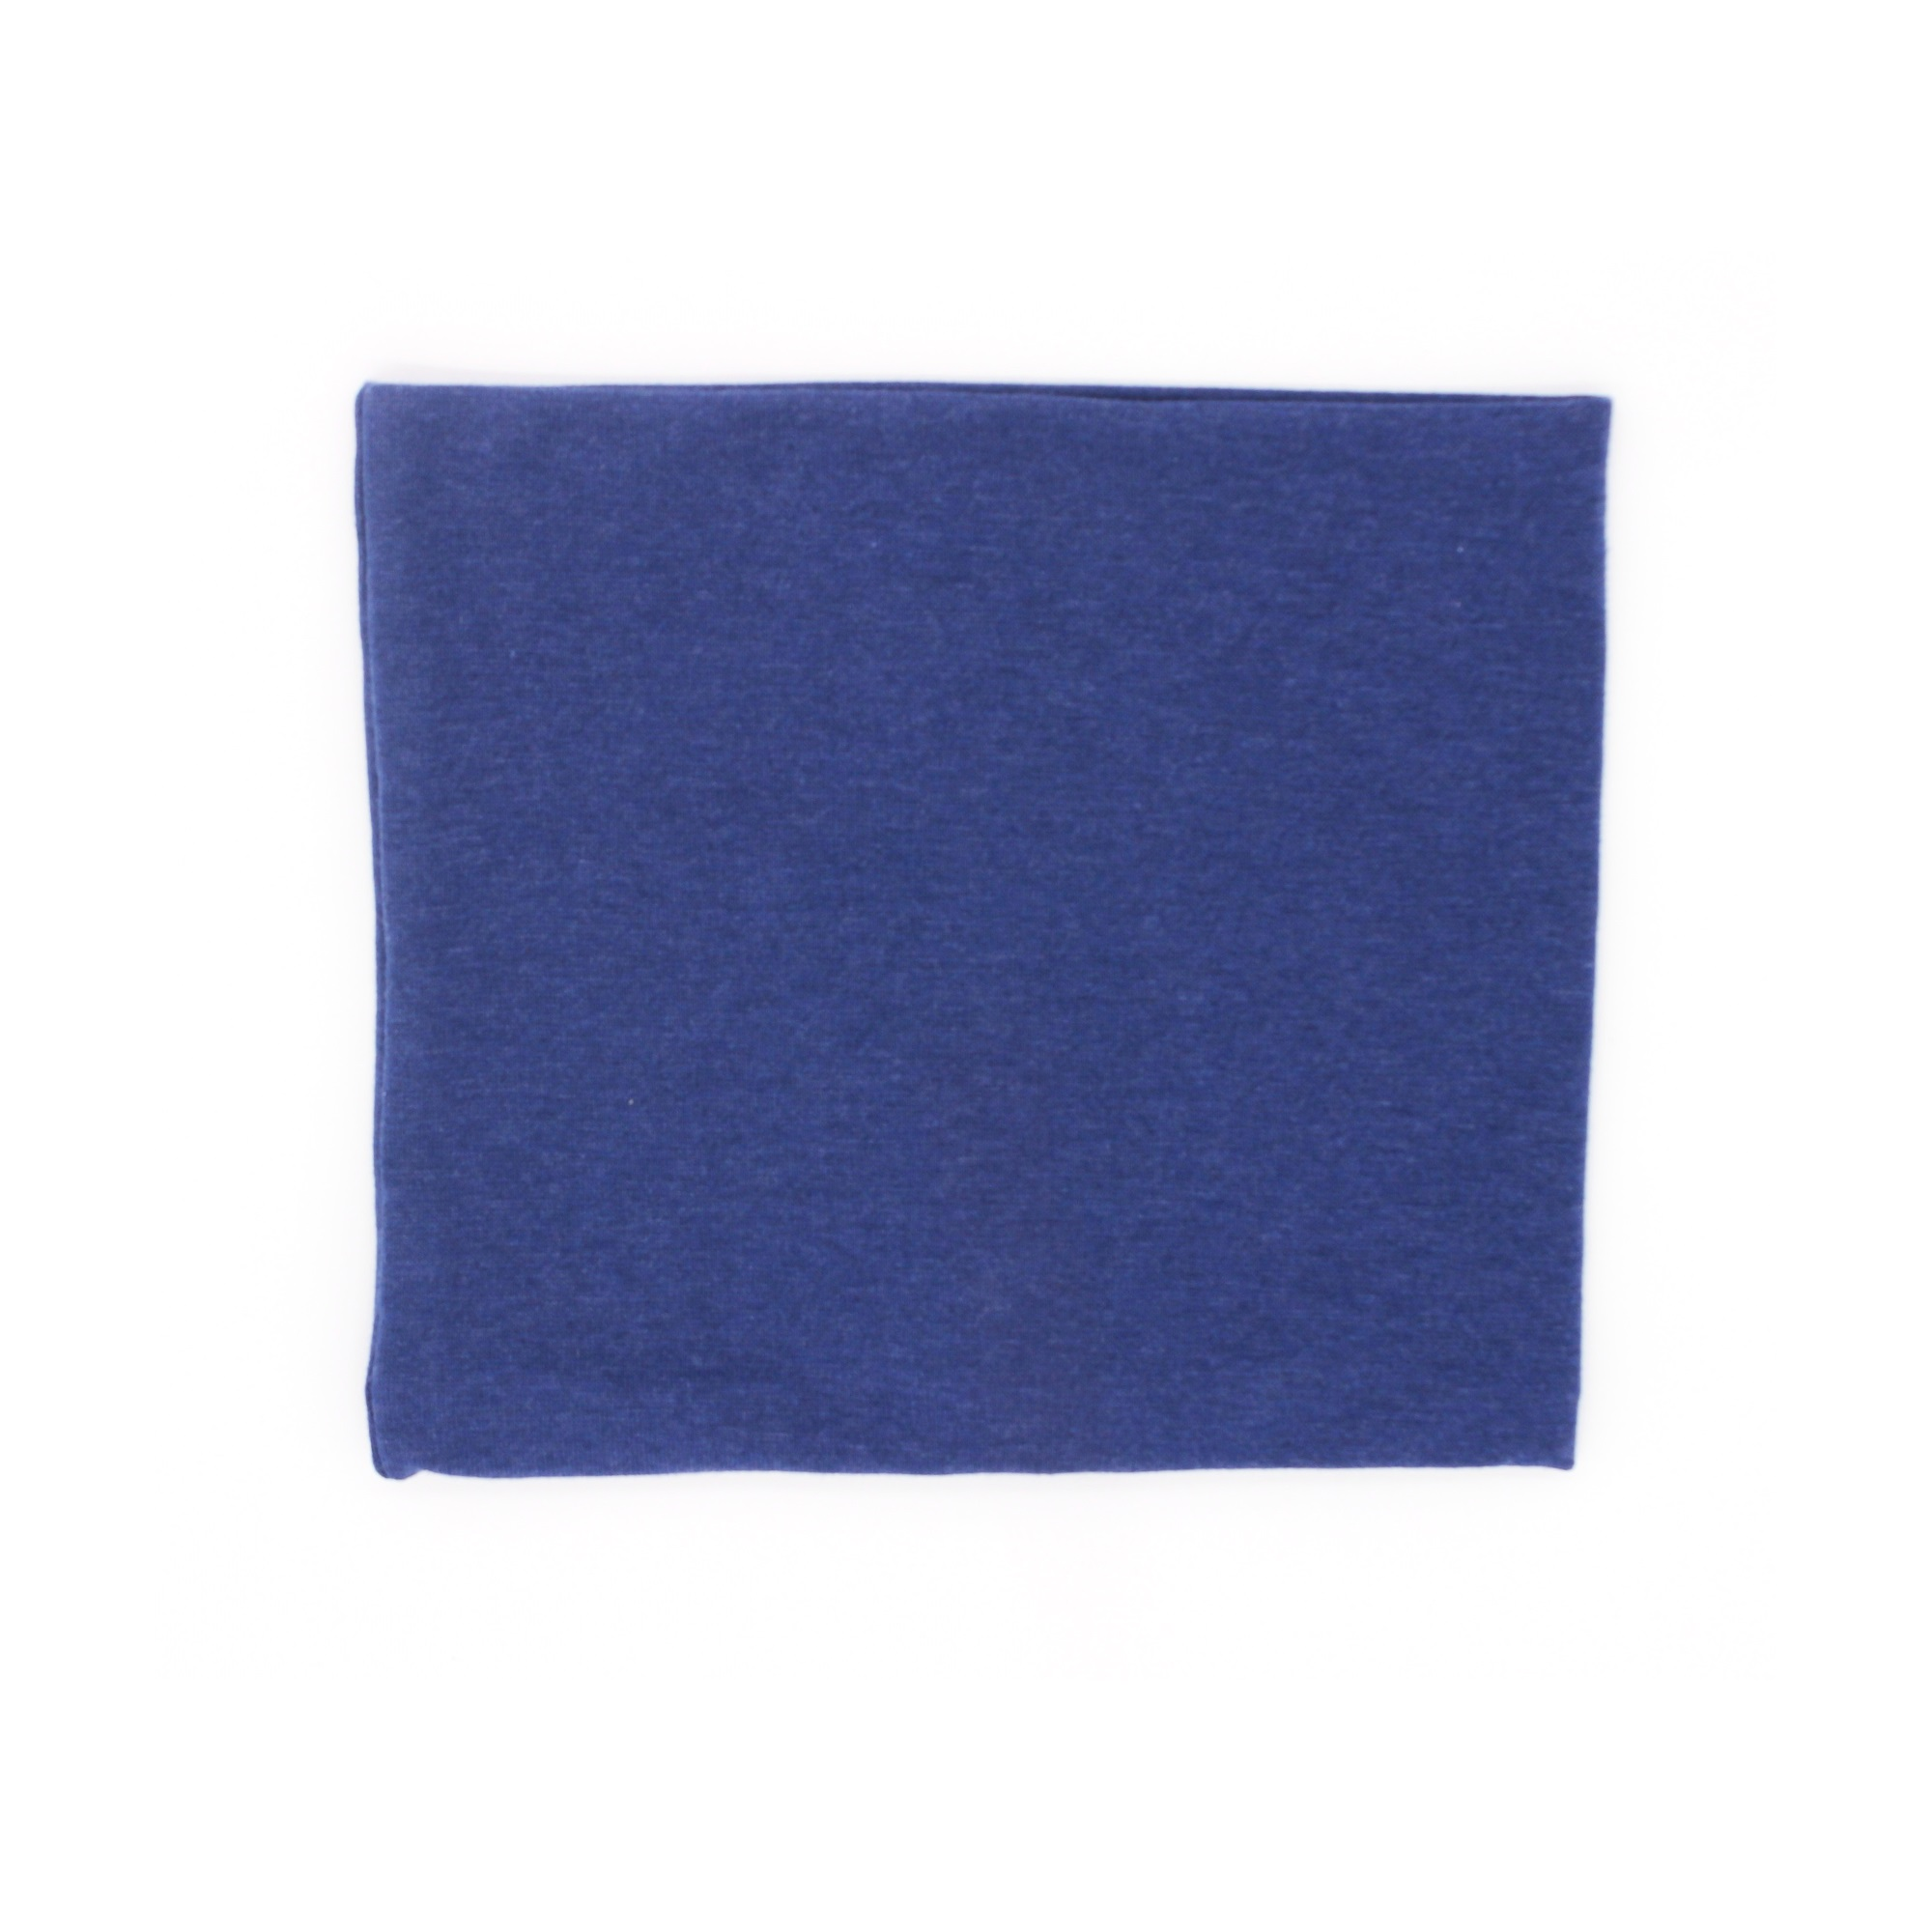 Шарф Nais, цвет: синий р.52-54 ДС.Снуд (джинс т. меланж)